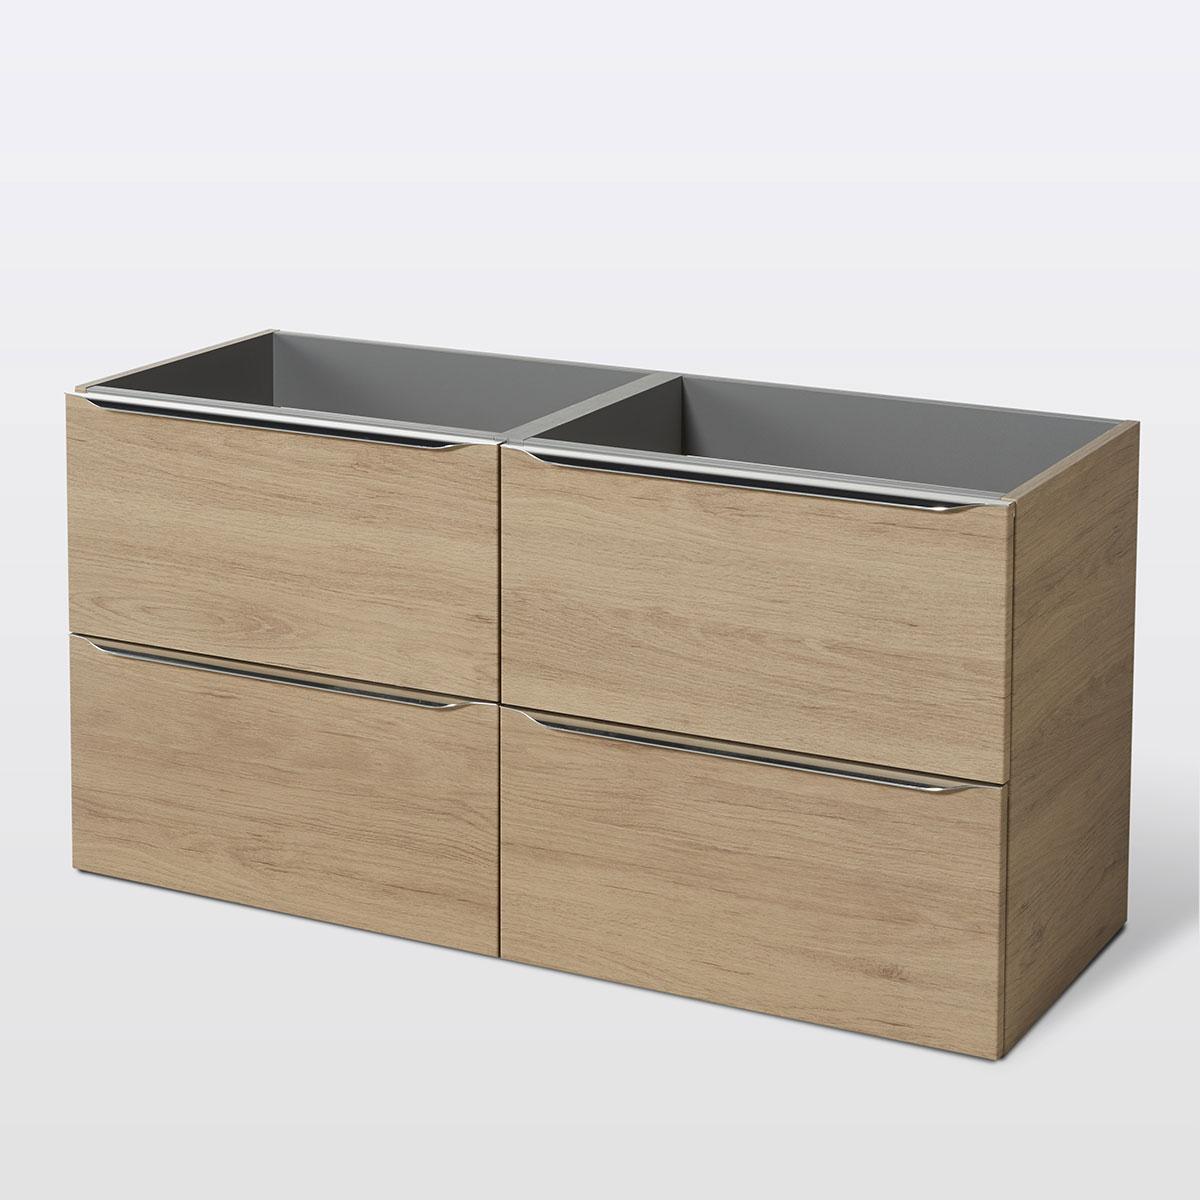 Meuble double vasque imitation chêne Imandra